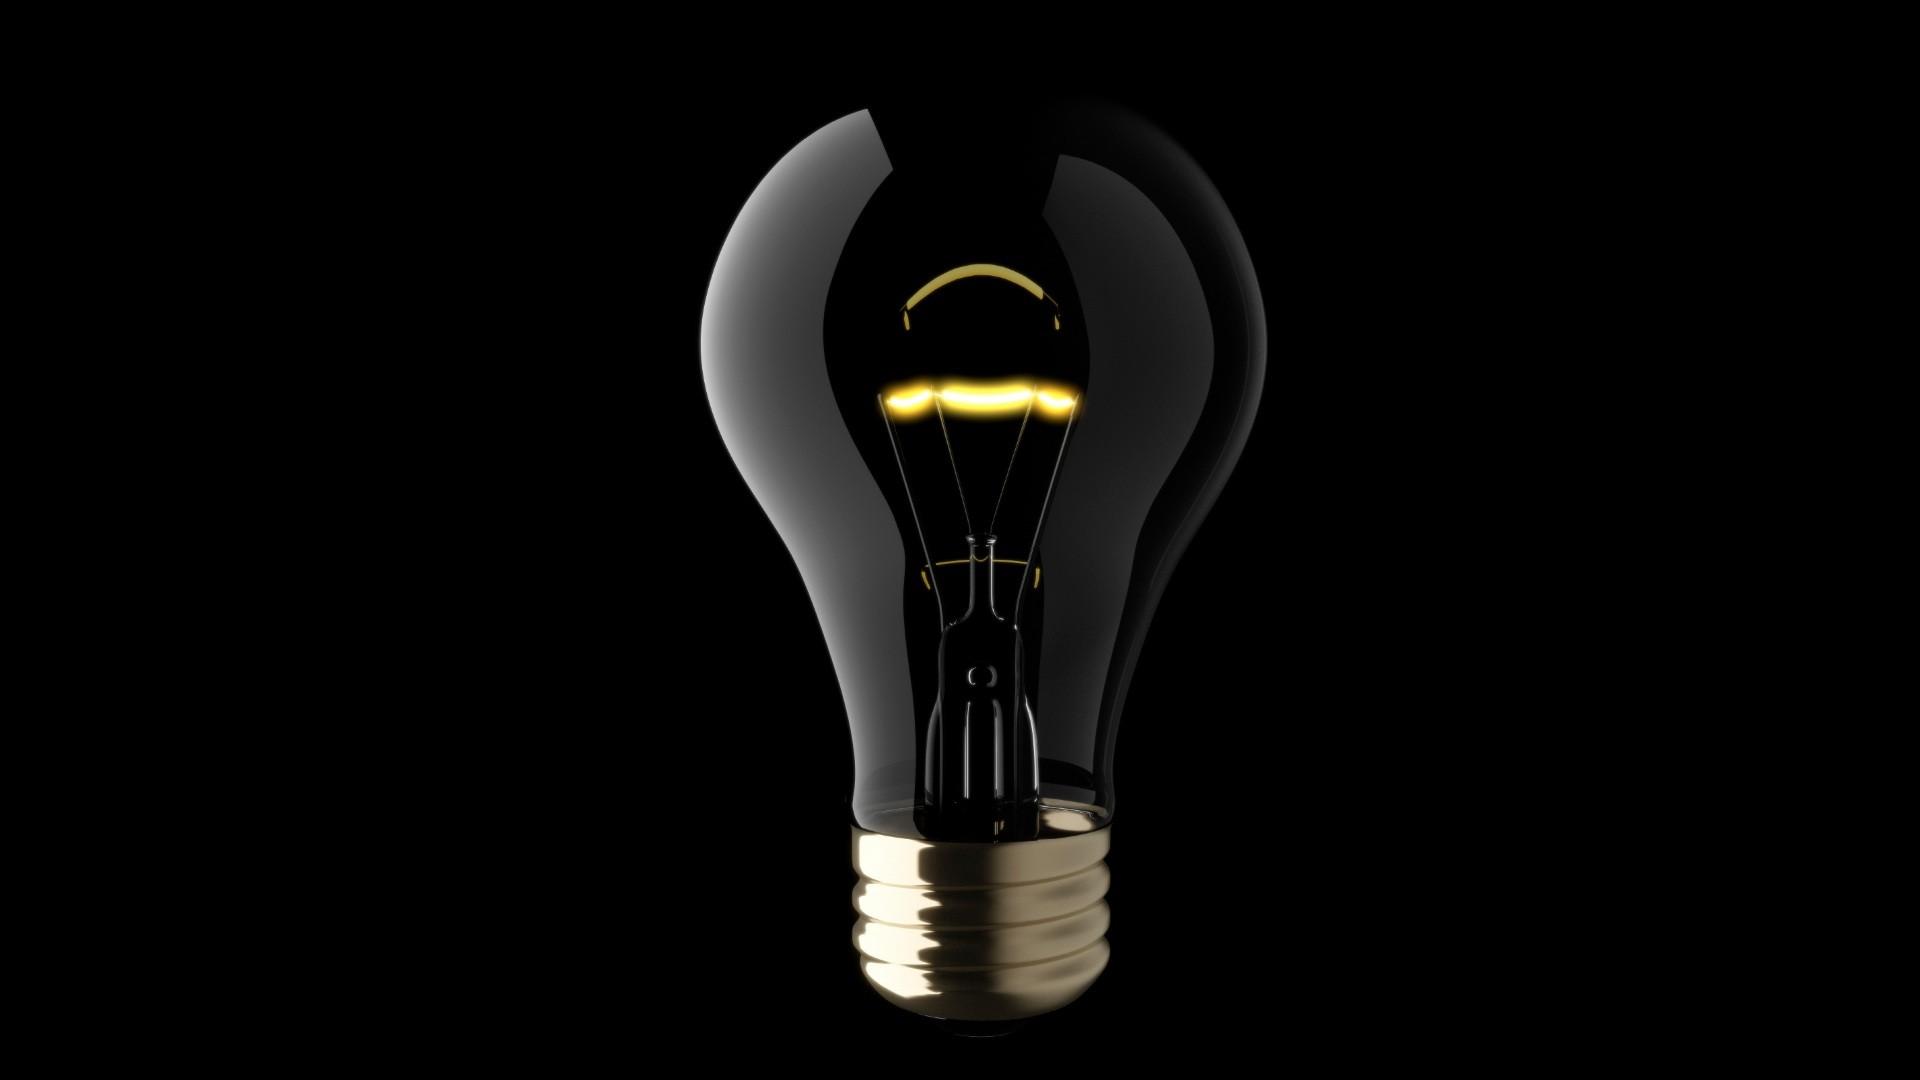 light Bulb Wallpaper by dragonxboy55 on DeviantArt   Light Bulb   Pinterest    Light bulb, Bulbs and Wallpaper